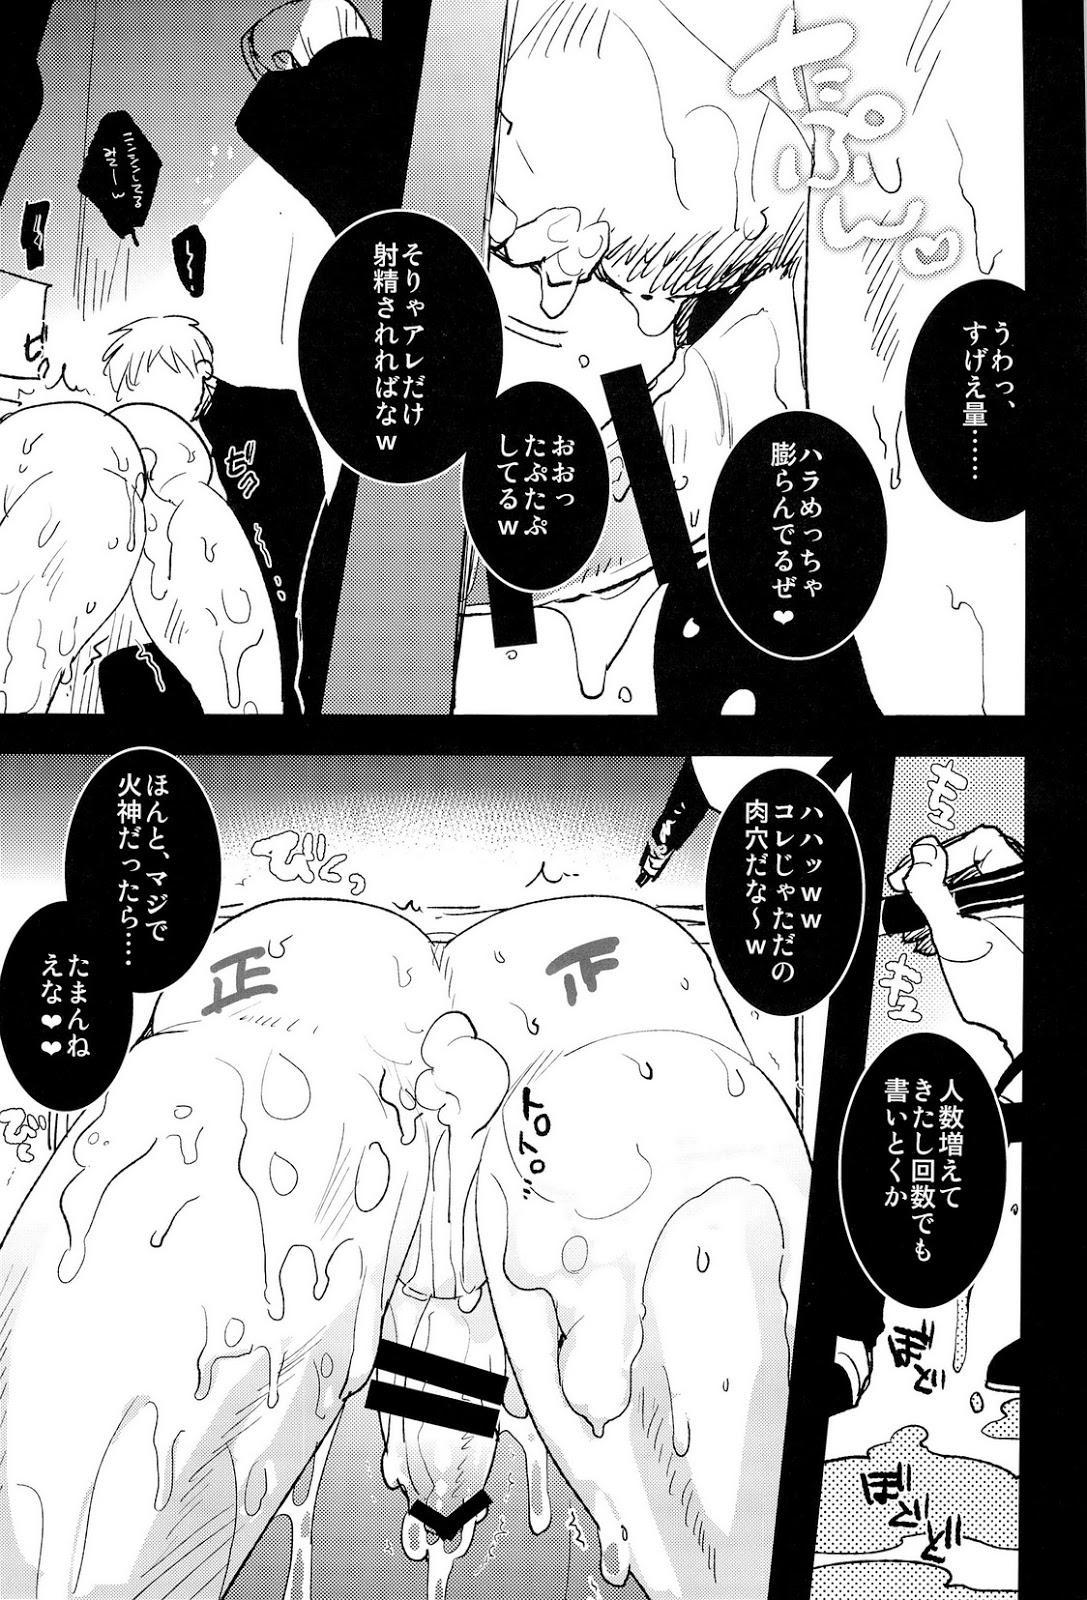 Kabejiri Hon - DK Fuck 20